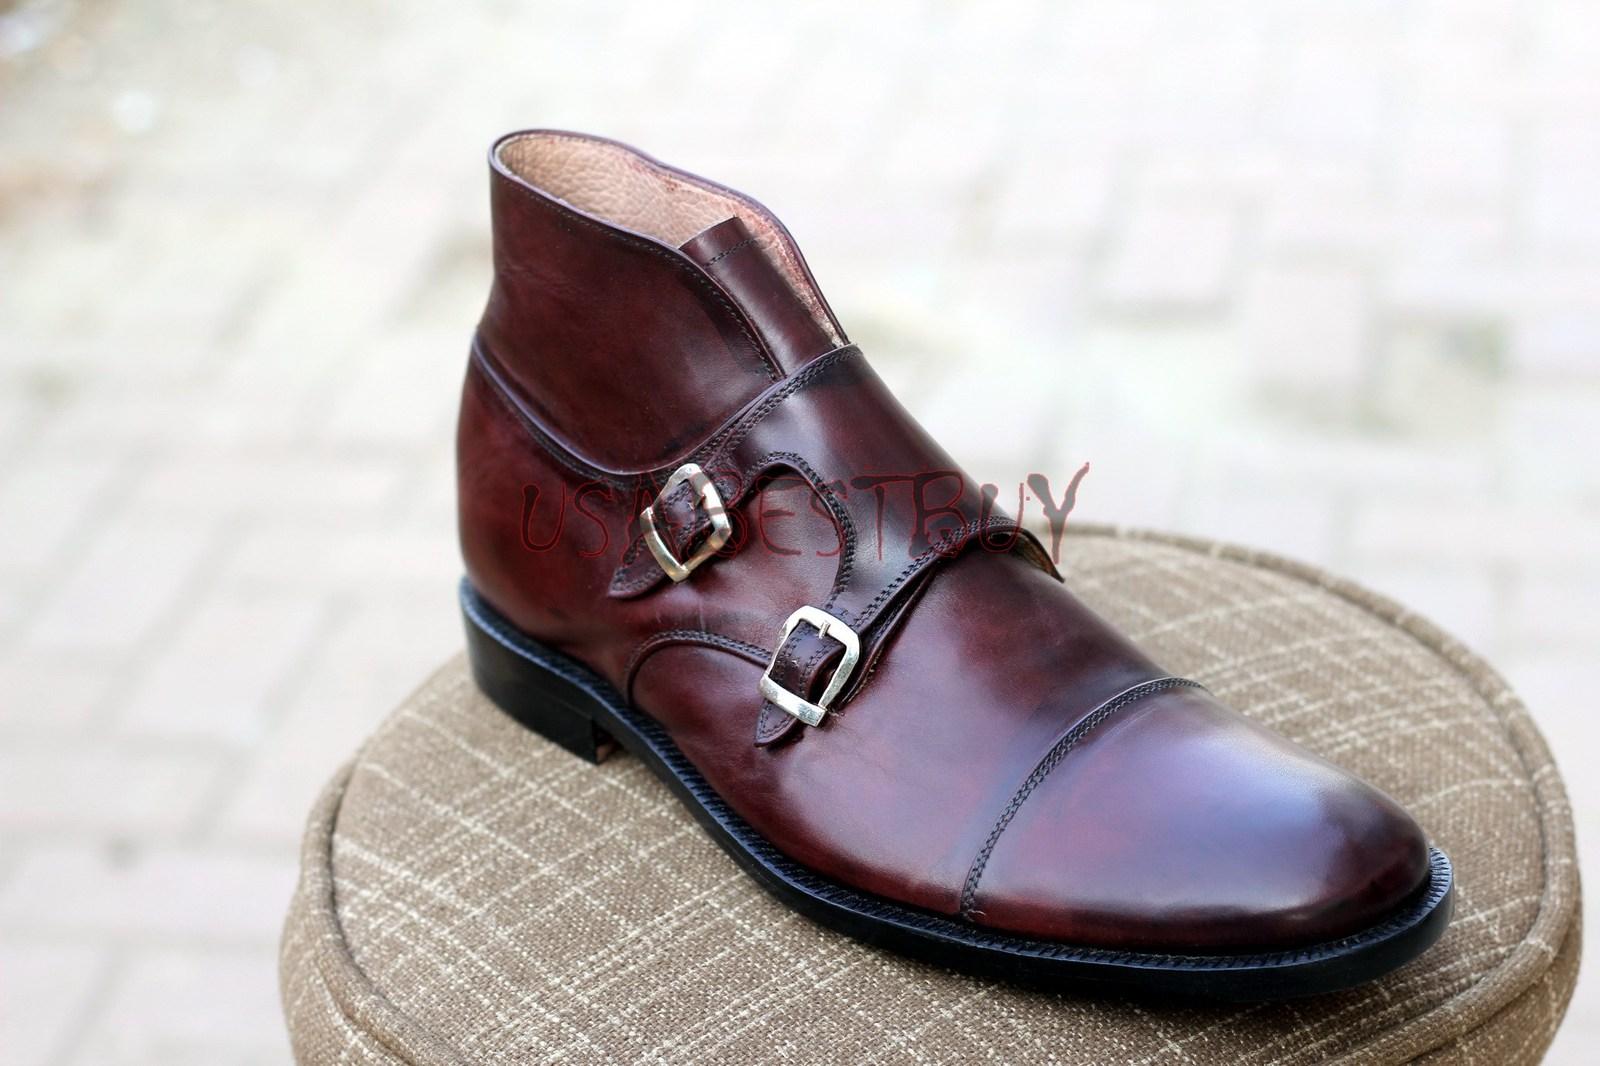 Custom Handmade Men Brogue in Chukka Style Black Leather Boots, Men Chukka Boots